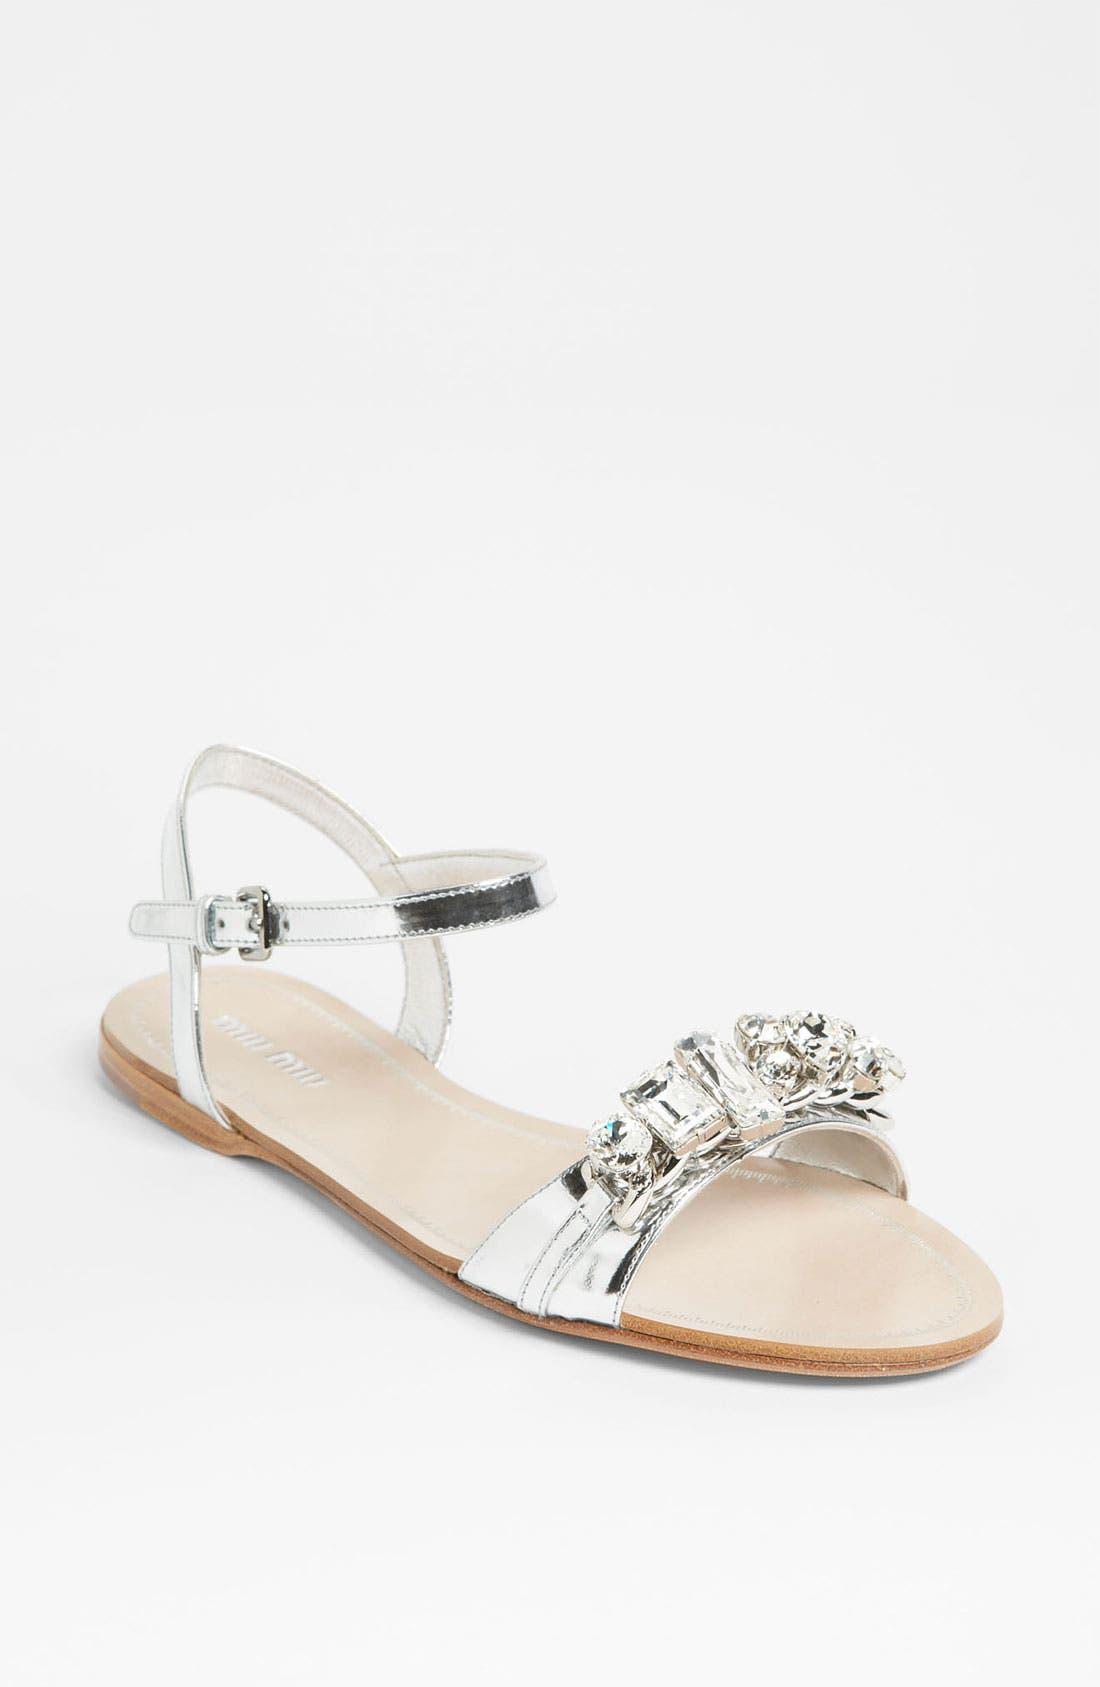 Main Image - Miu Miu Ankle Strap Jewel Sandal